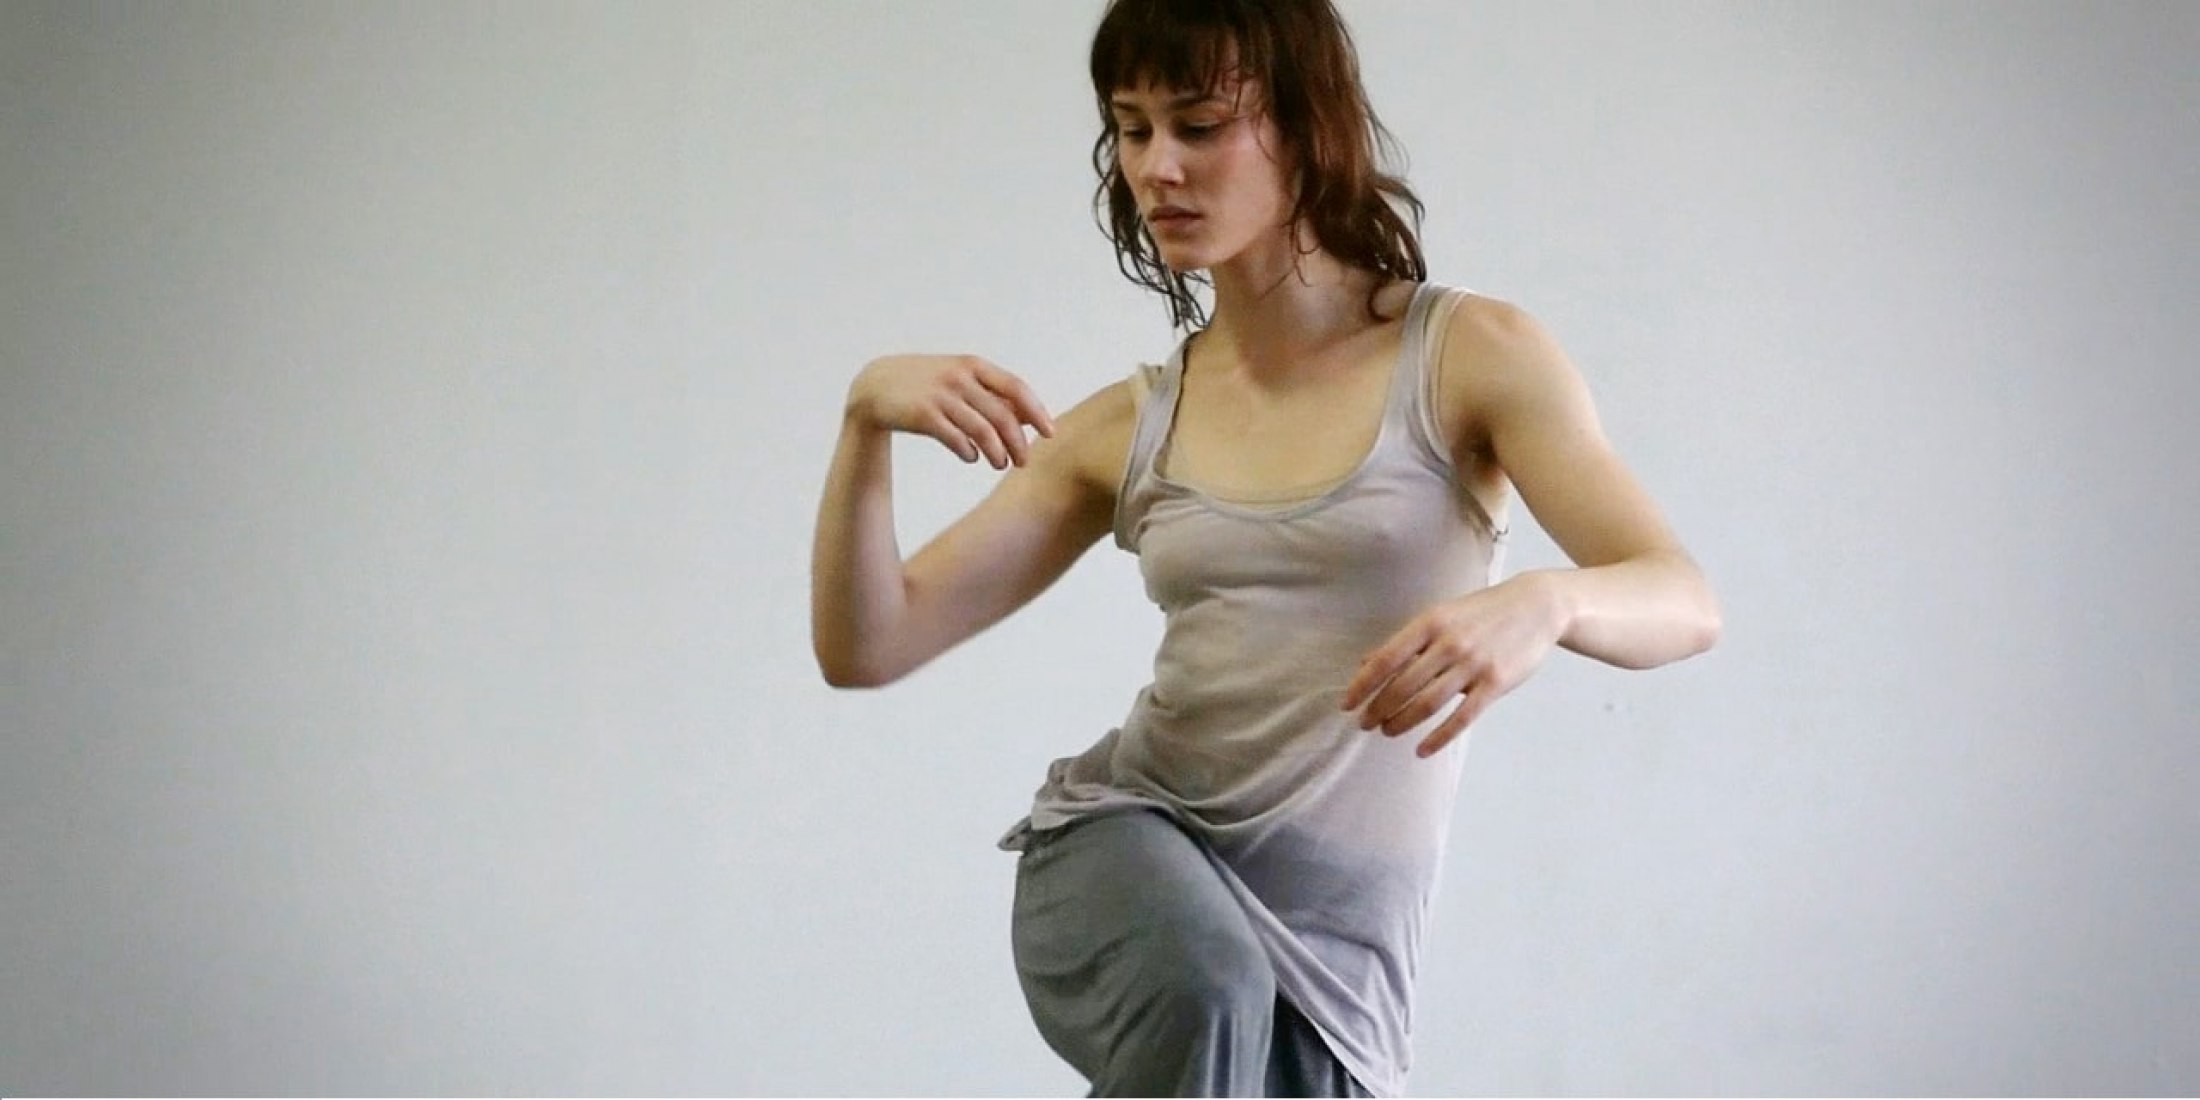 Unnamed soundsculpture. Cedric Kiefer, Julia Laub (onformative) y Daniel Franke (We are Chopchop)